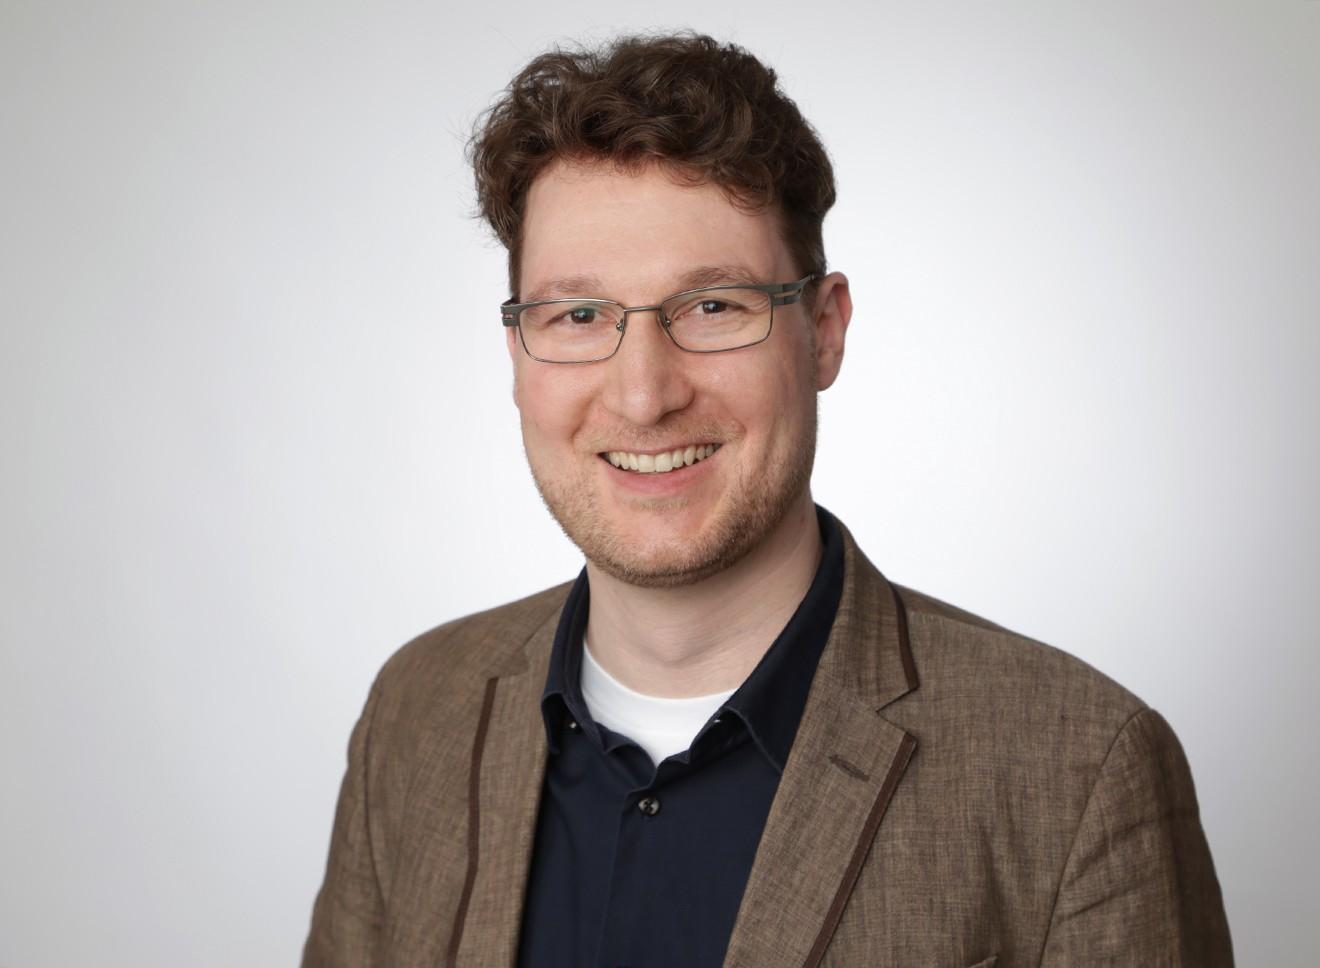 MPU Berater und Verkehrspsychologe Christoph Weber